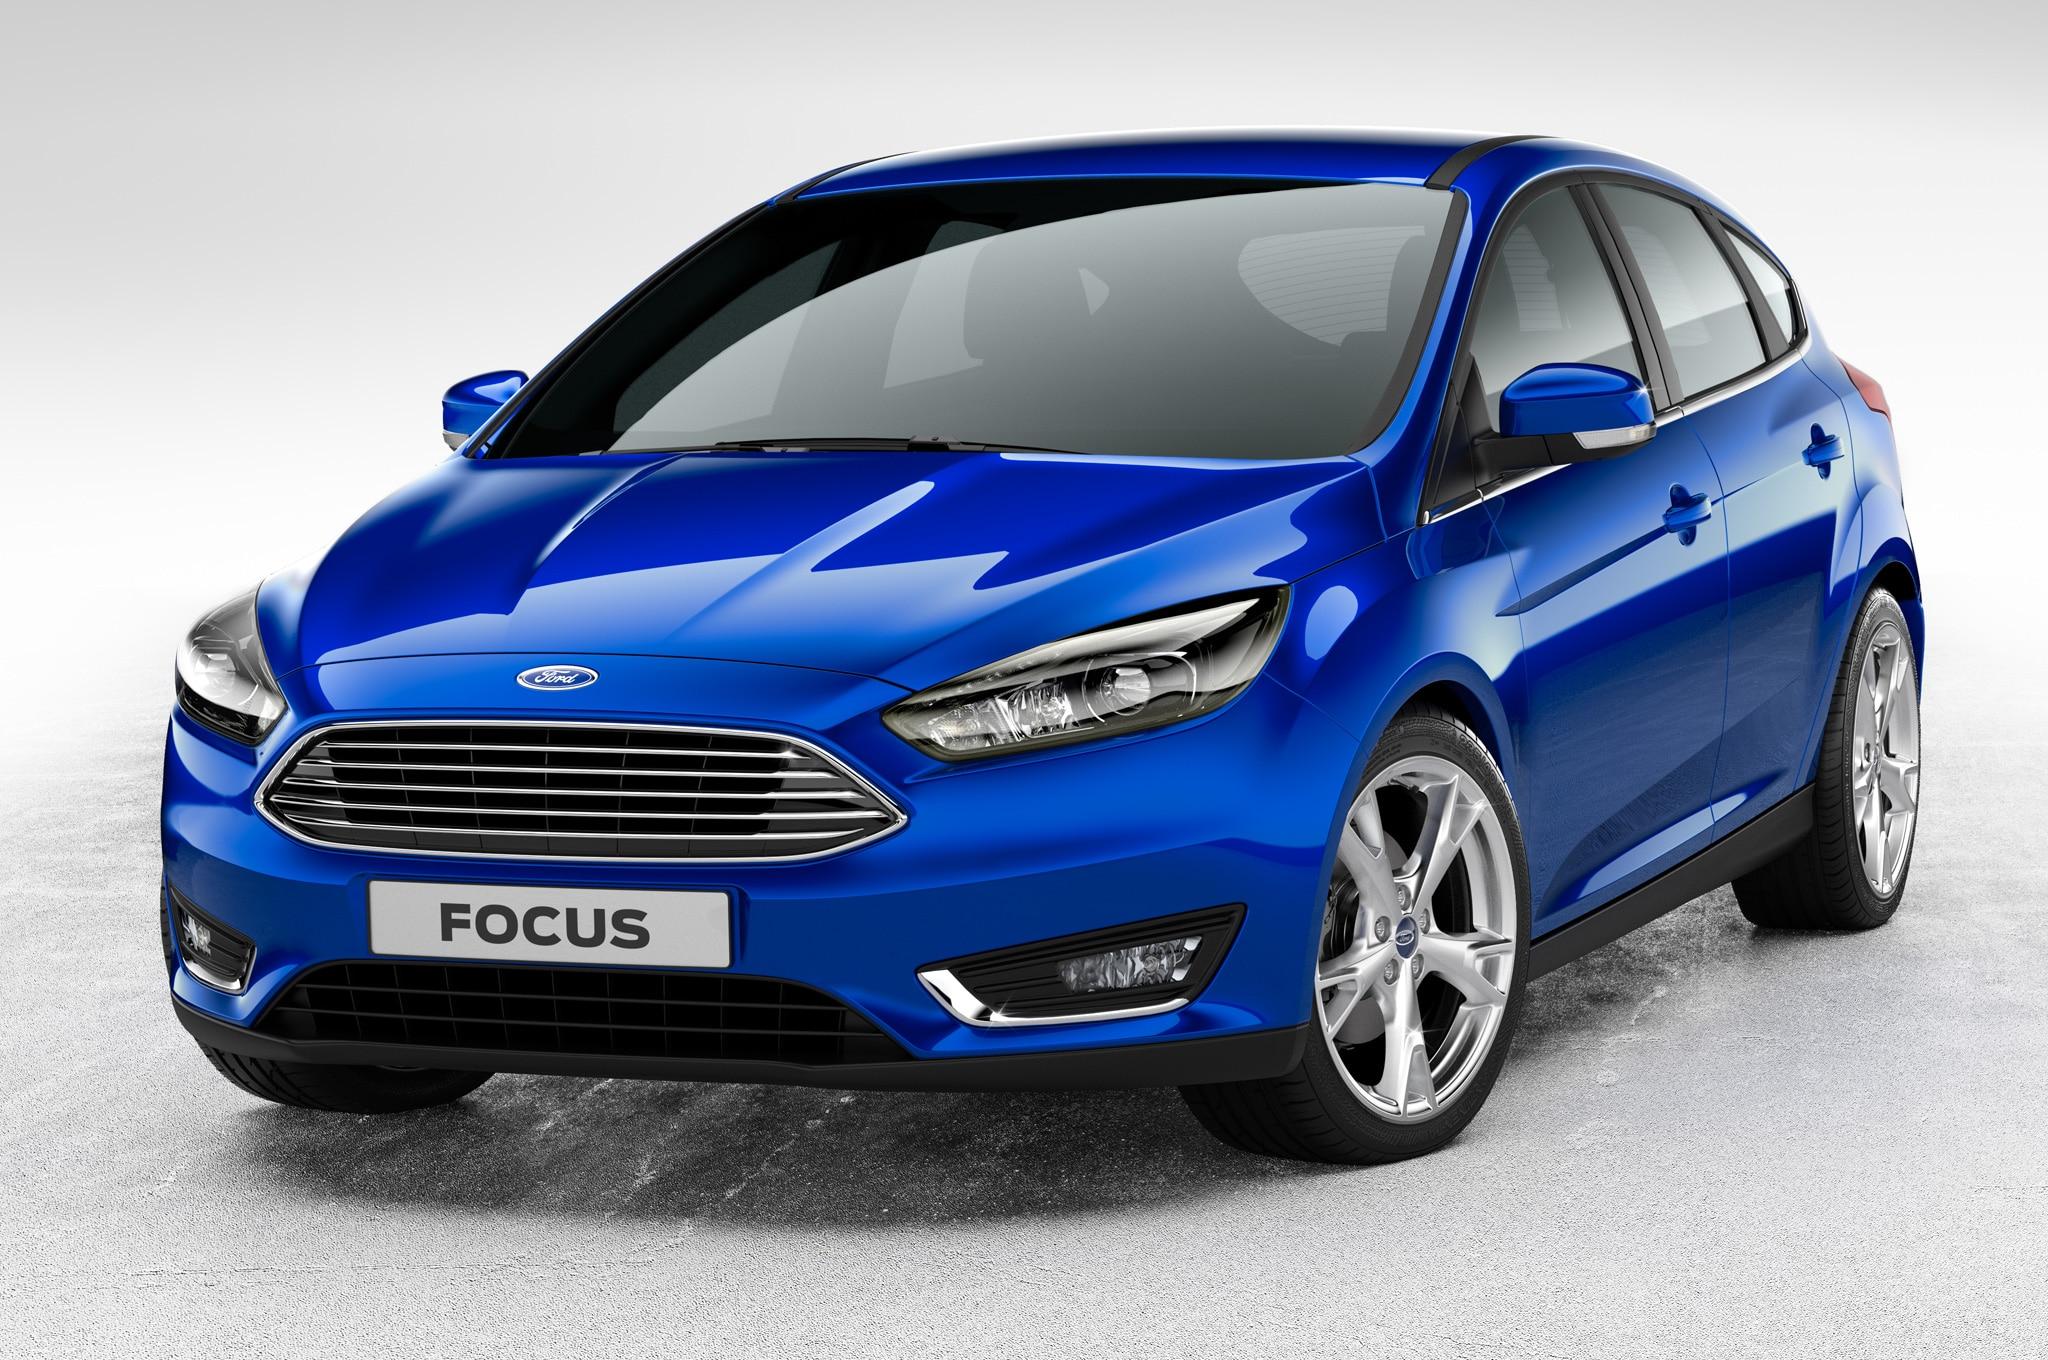 2015 ford focus sedan - Show More